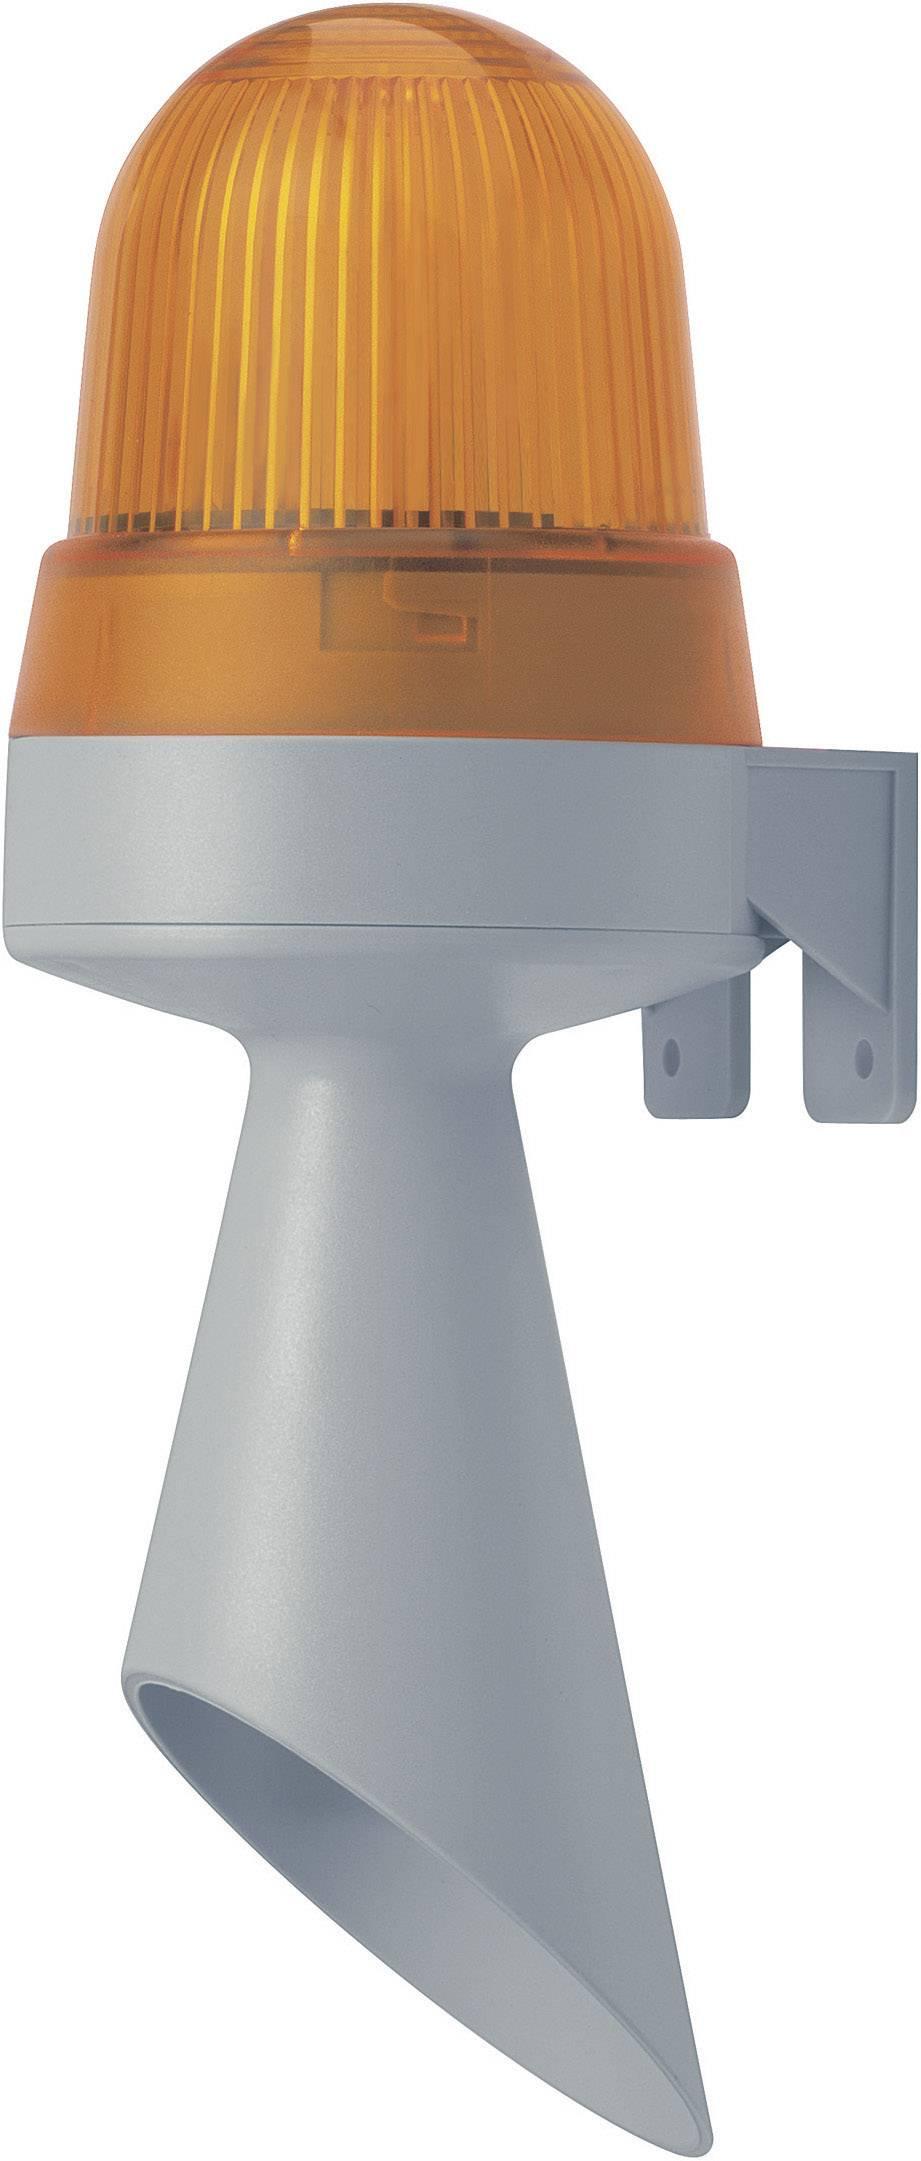 Siréna s LED Werma 424.320.75, 24 V/DC, IP65, žlutá